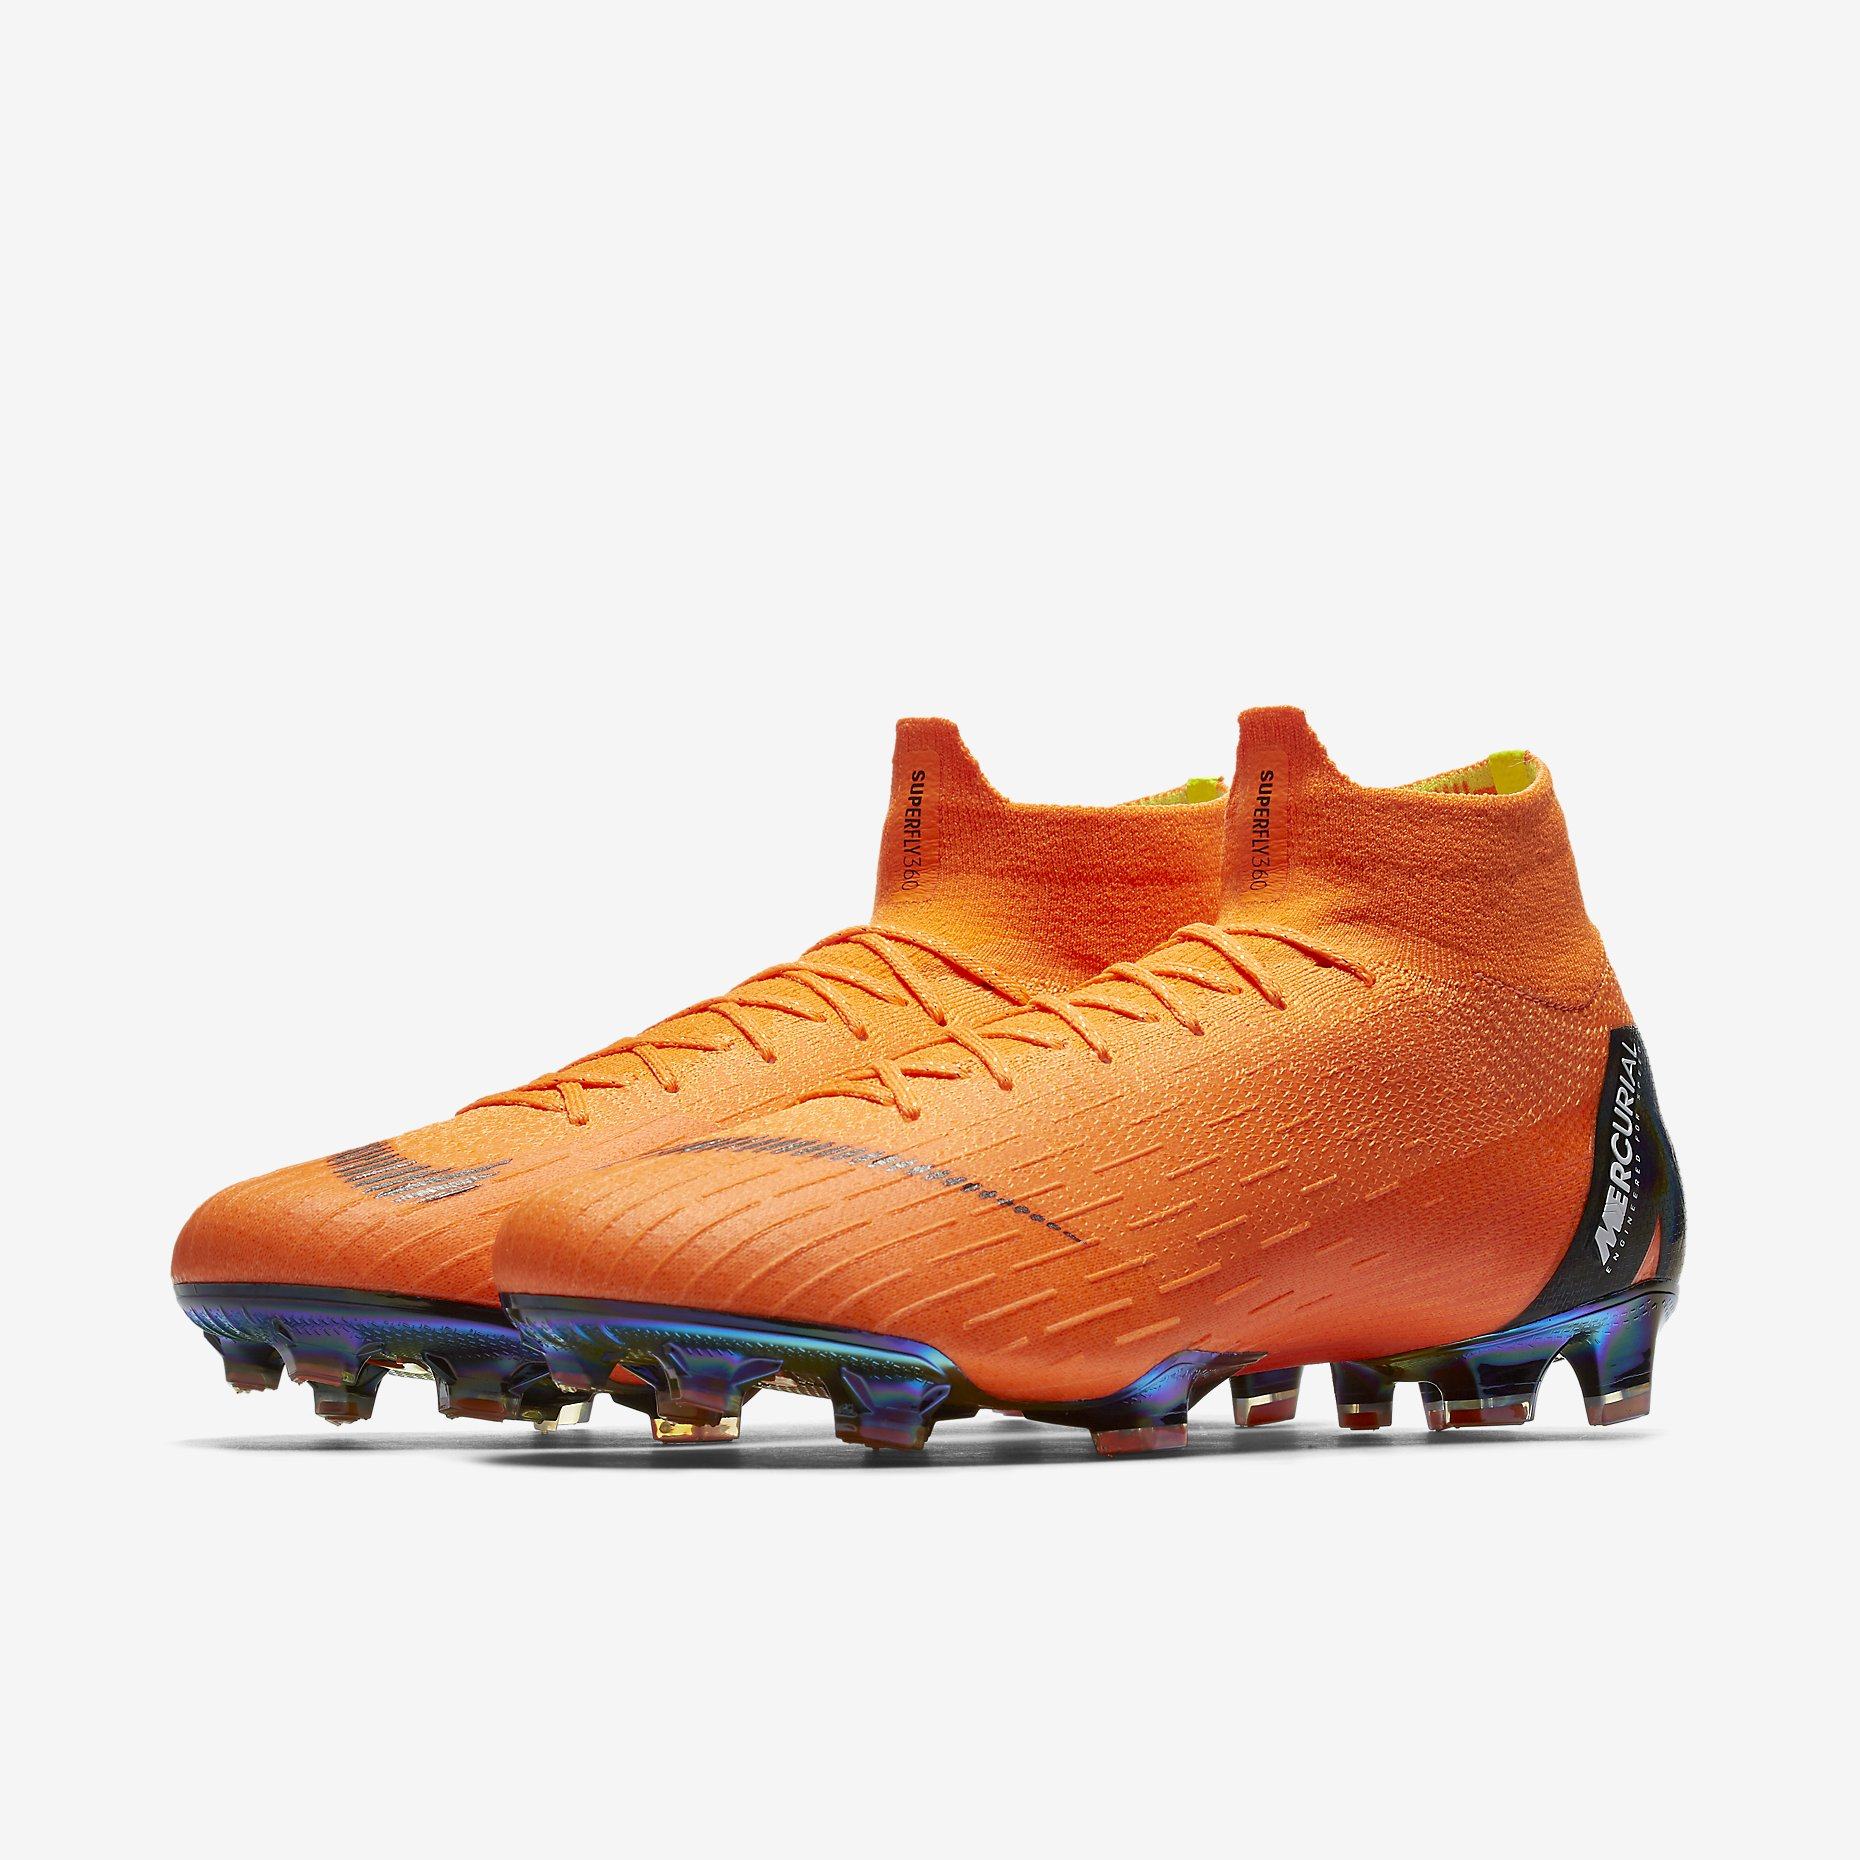 new product 755f1 6310f Nike Mercurial Superfly 360 Elite FG - Total Orange / Total ...